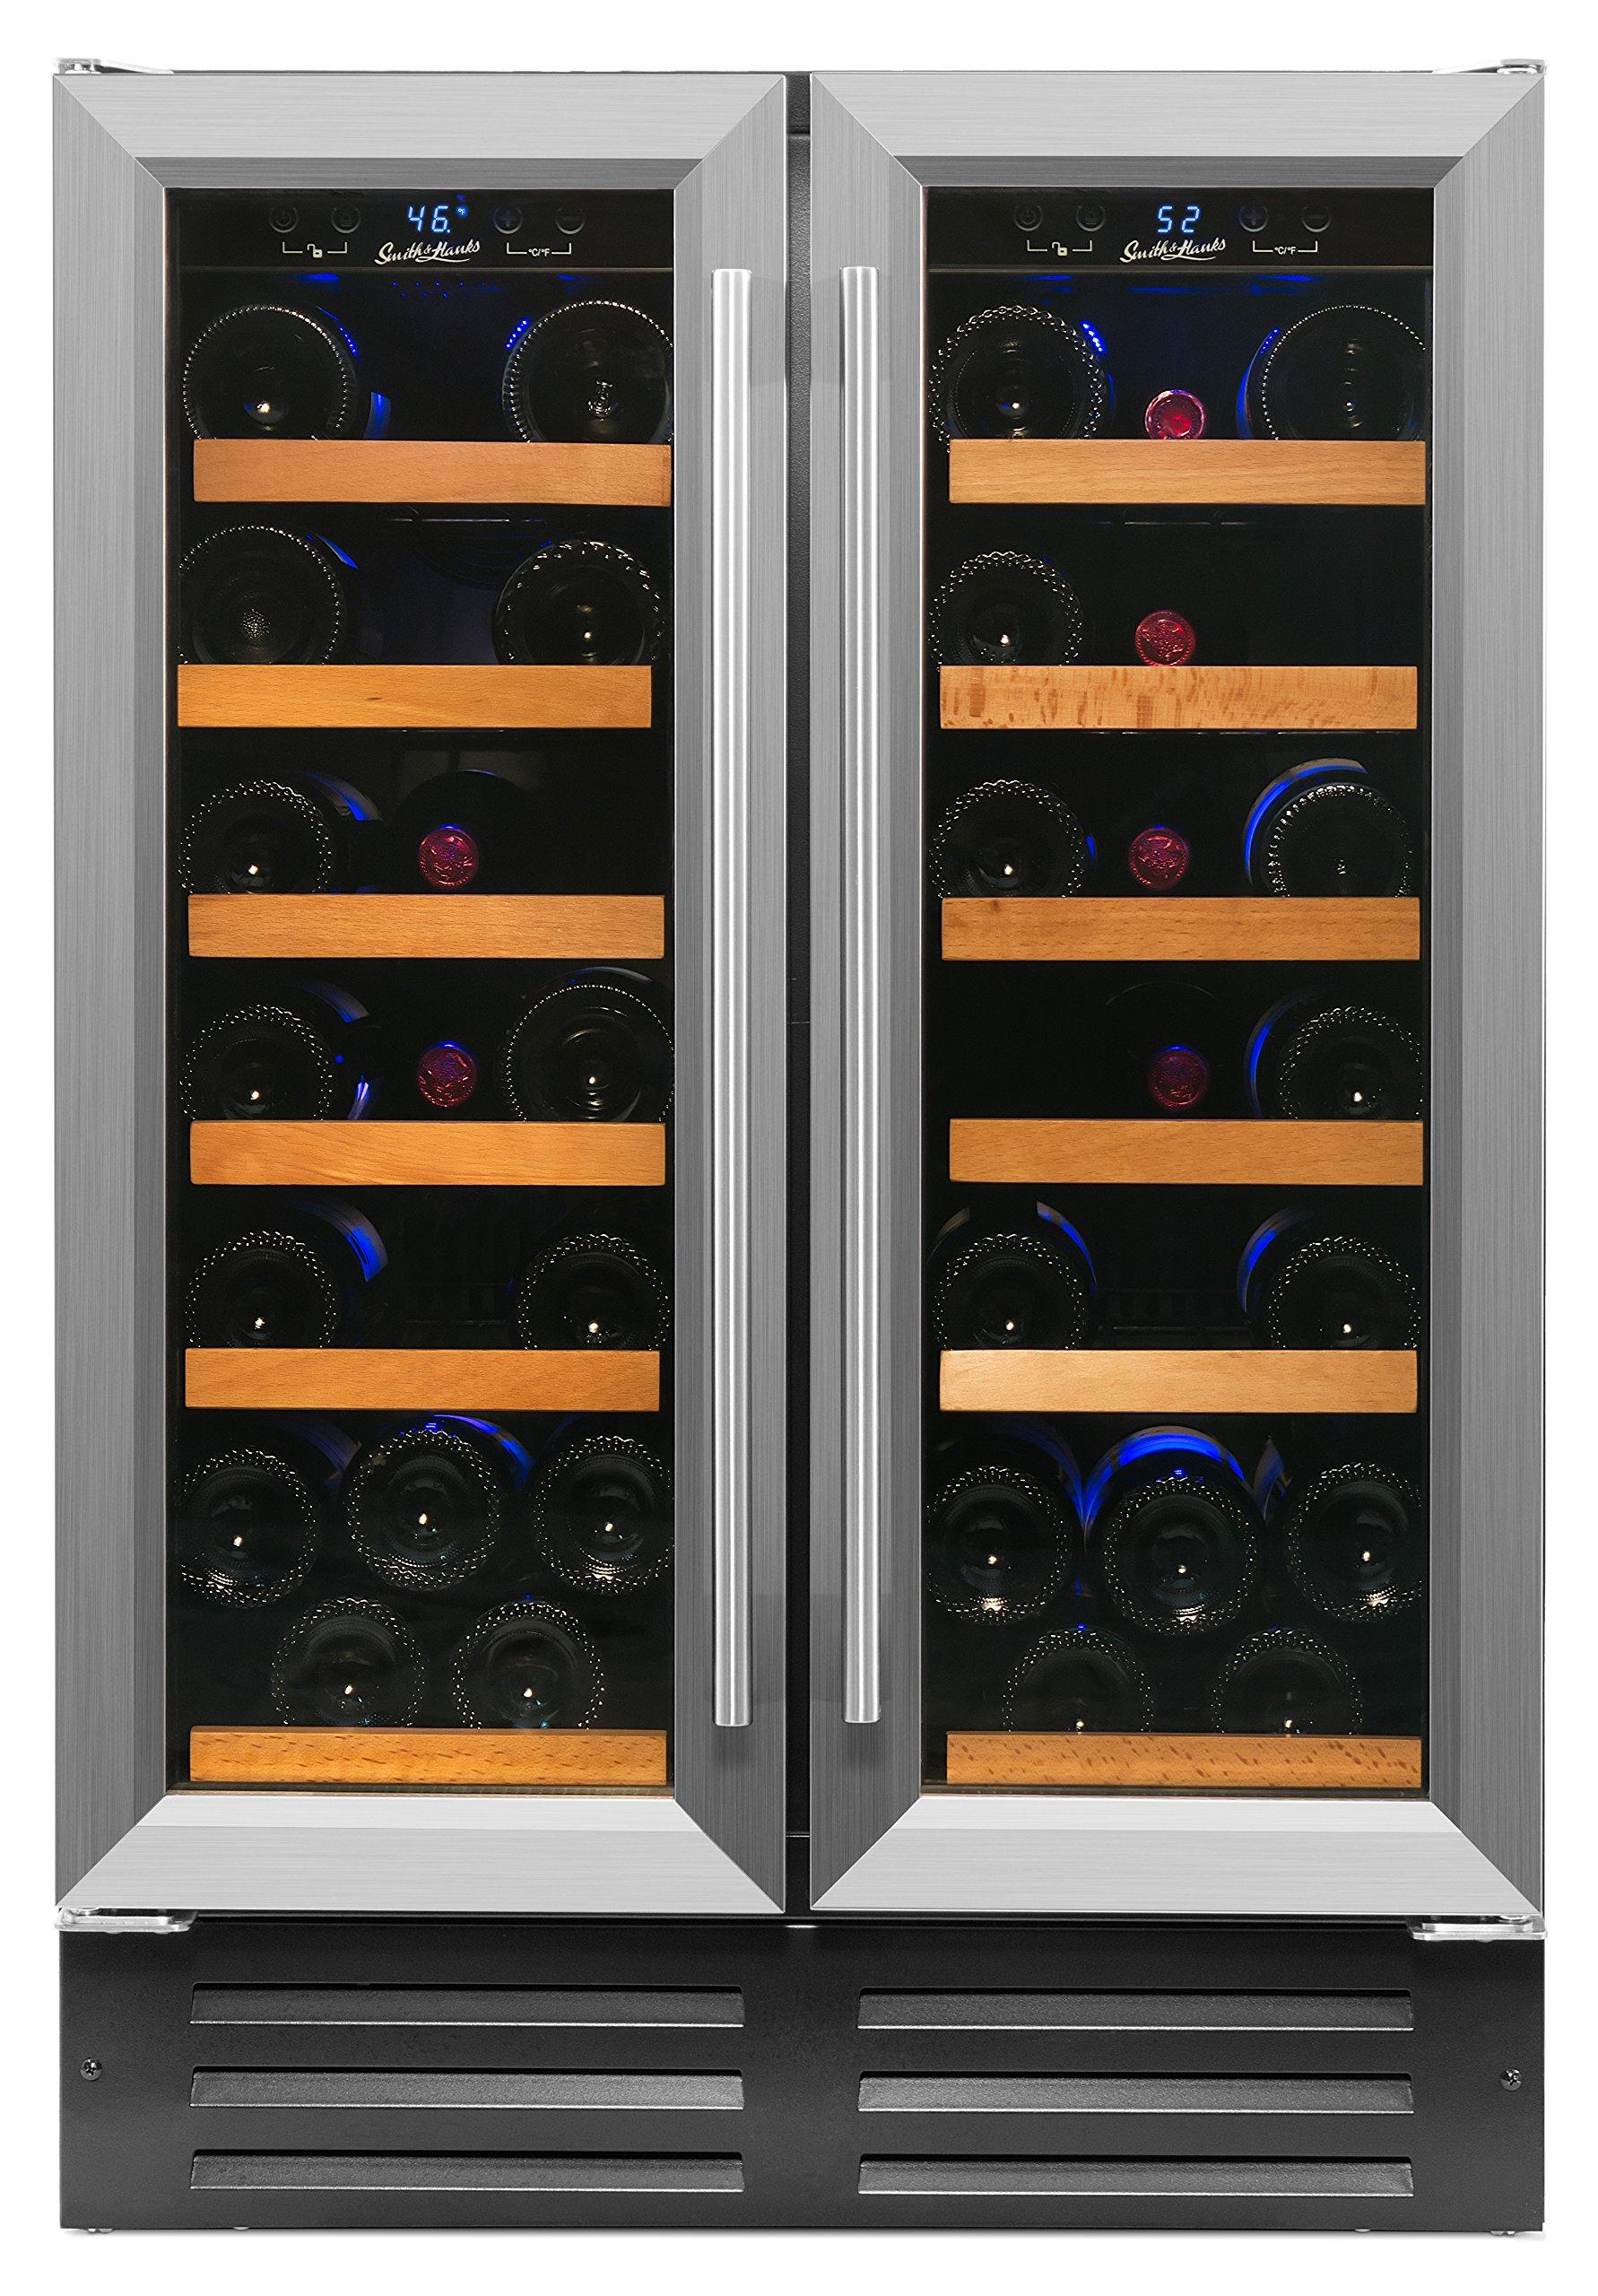 Smith & Hanks 40 Bottle Dual Zone Wine Refrigerator, Stainless Steel Door, Built-In or Free Standing, Professional Series